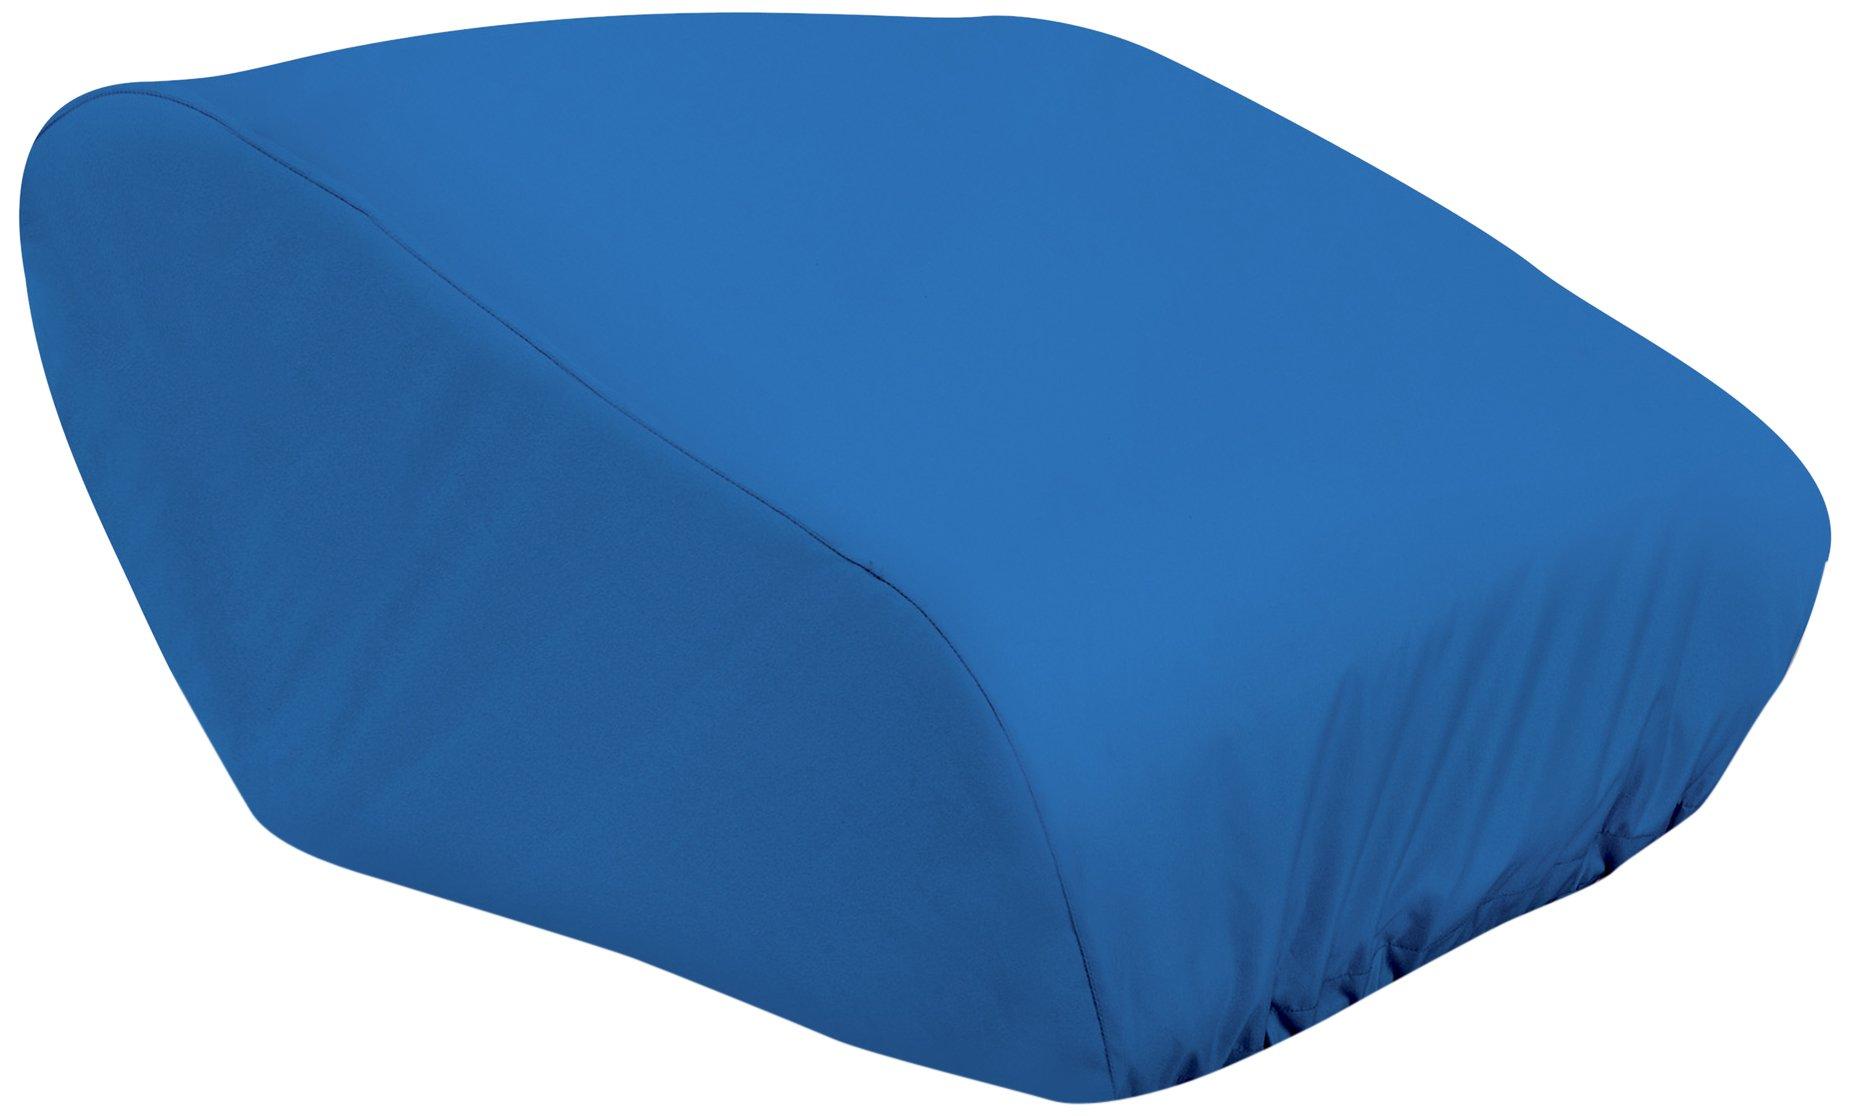 Classic Accessories Boat Folding Seat Cover, Medium, Blue